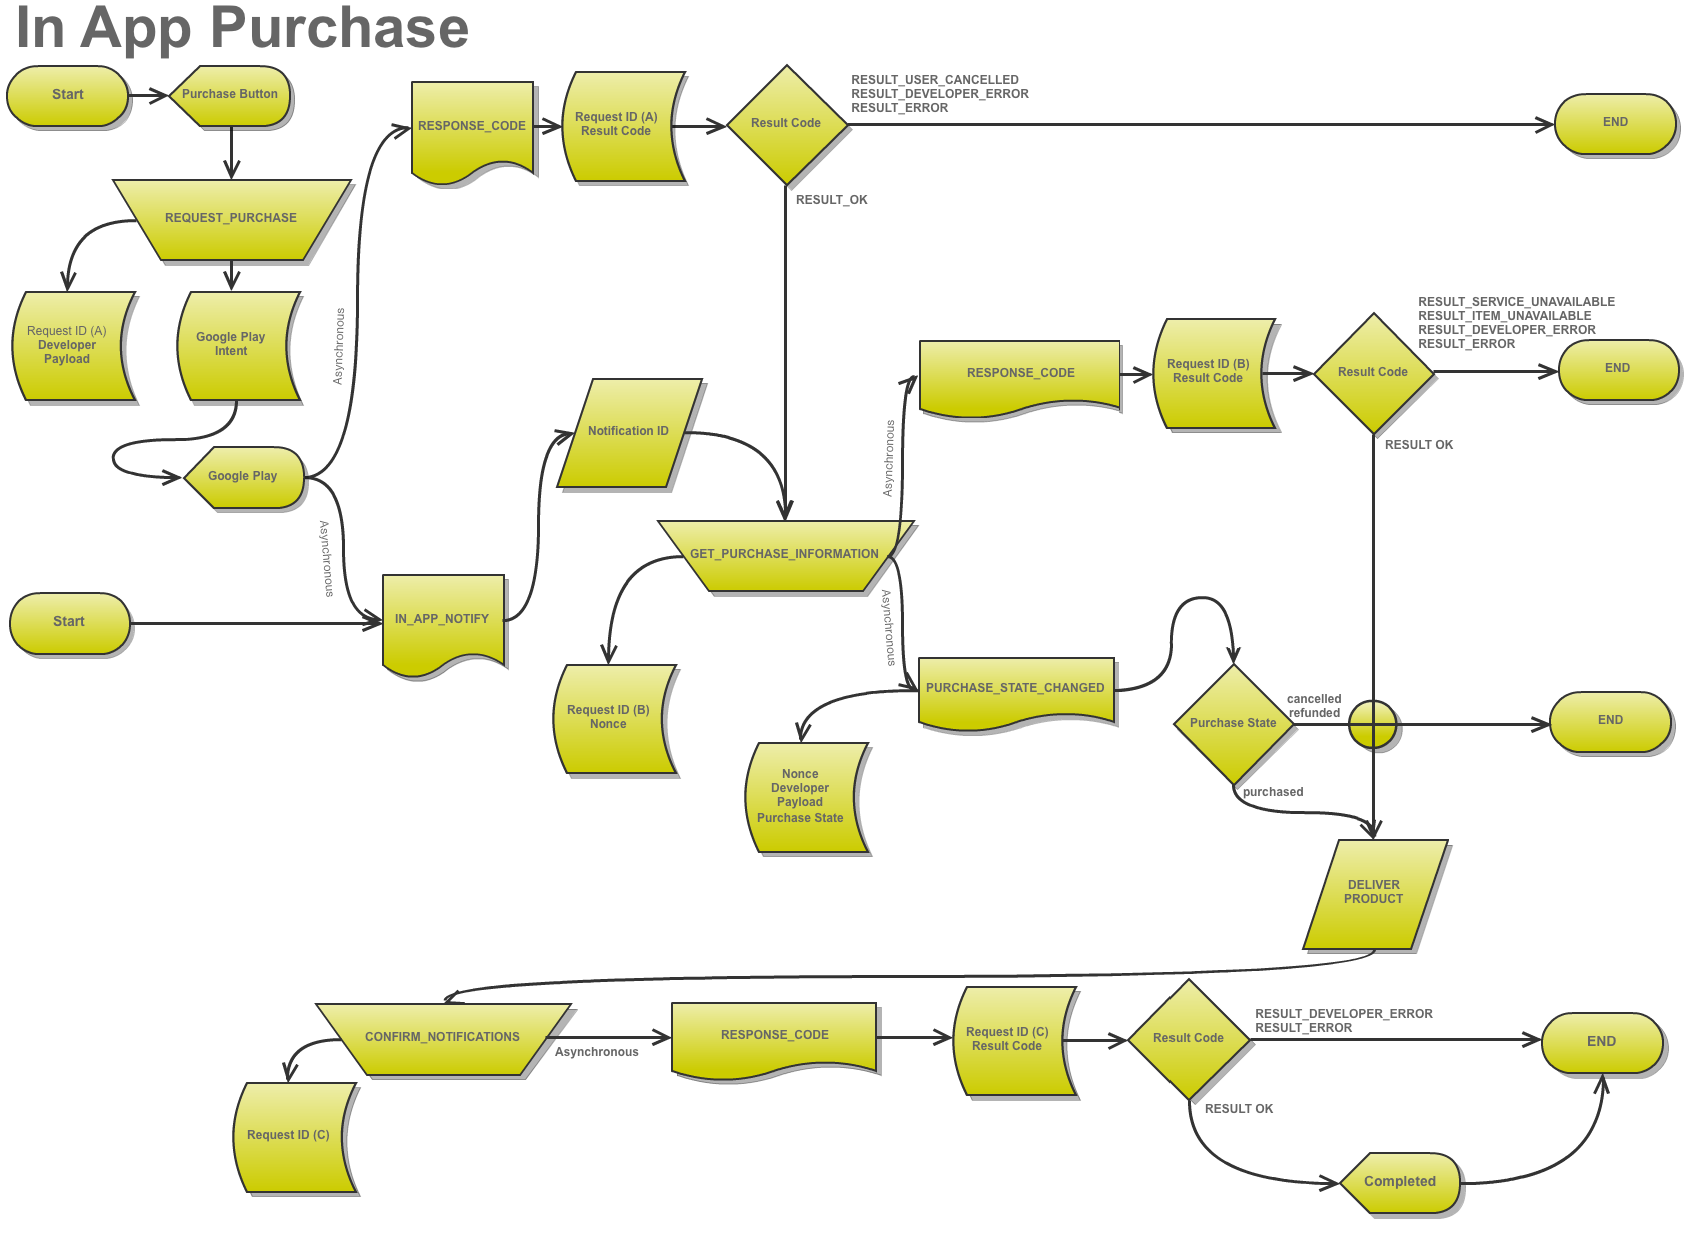 Overview of In App Billing (FlowChart) | Blundell